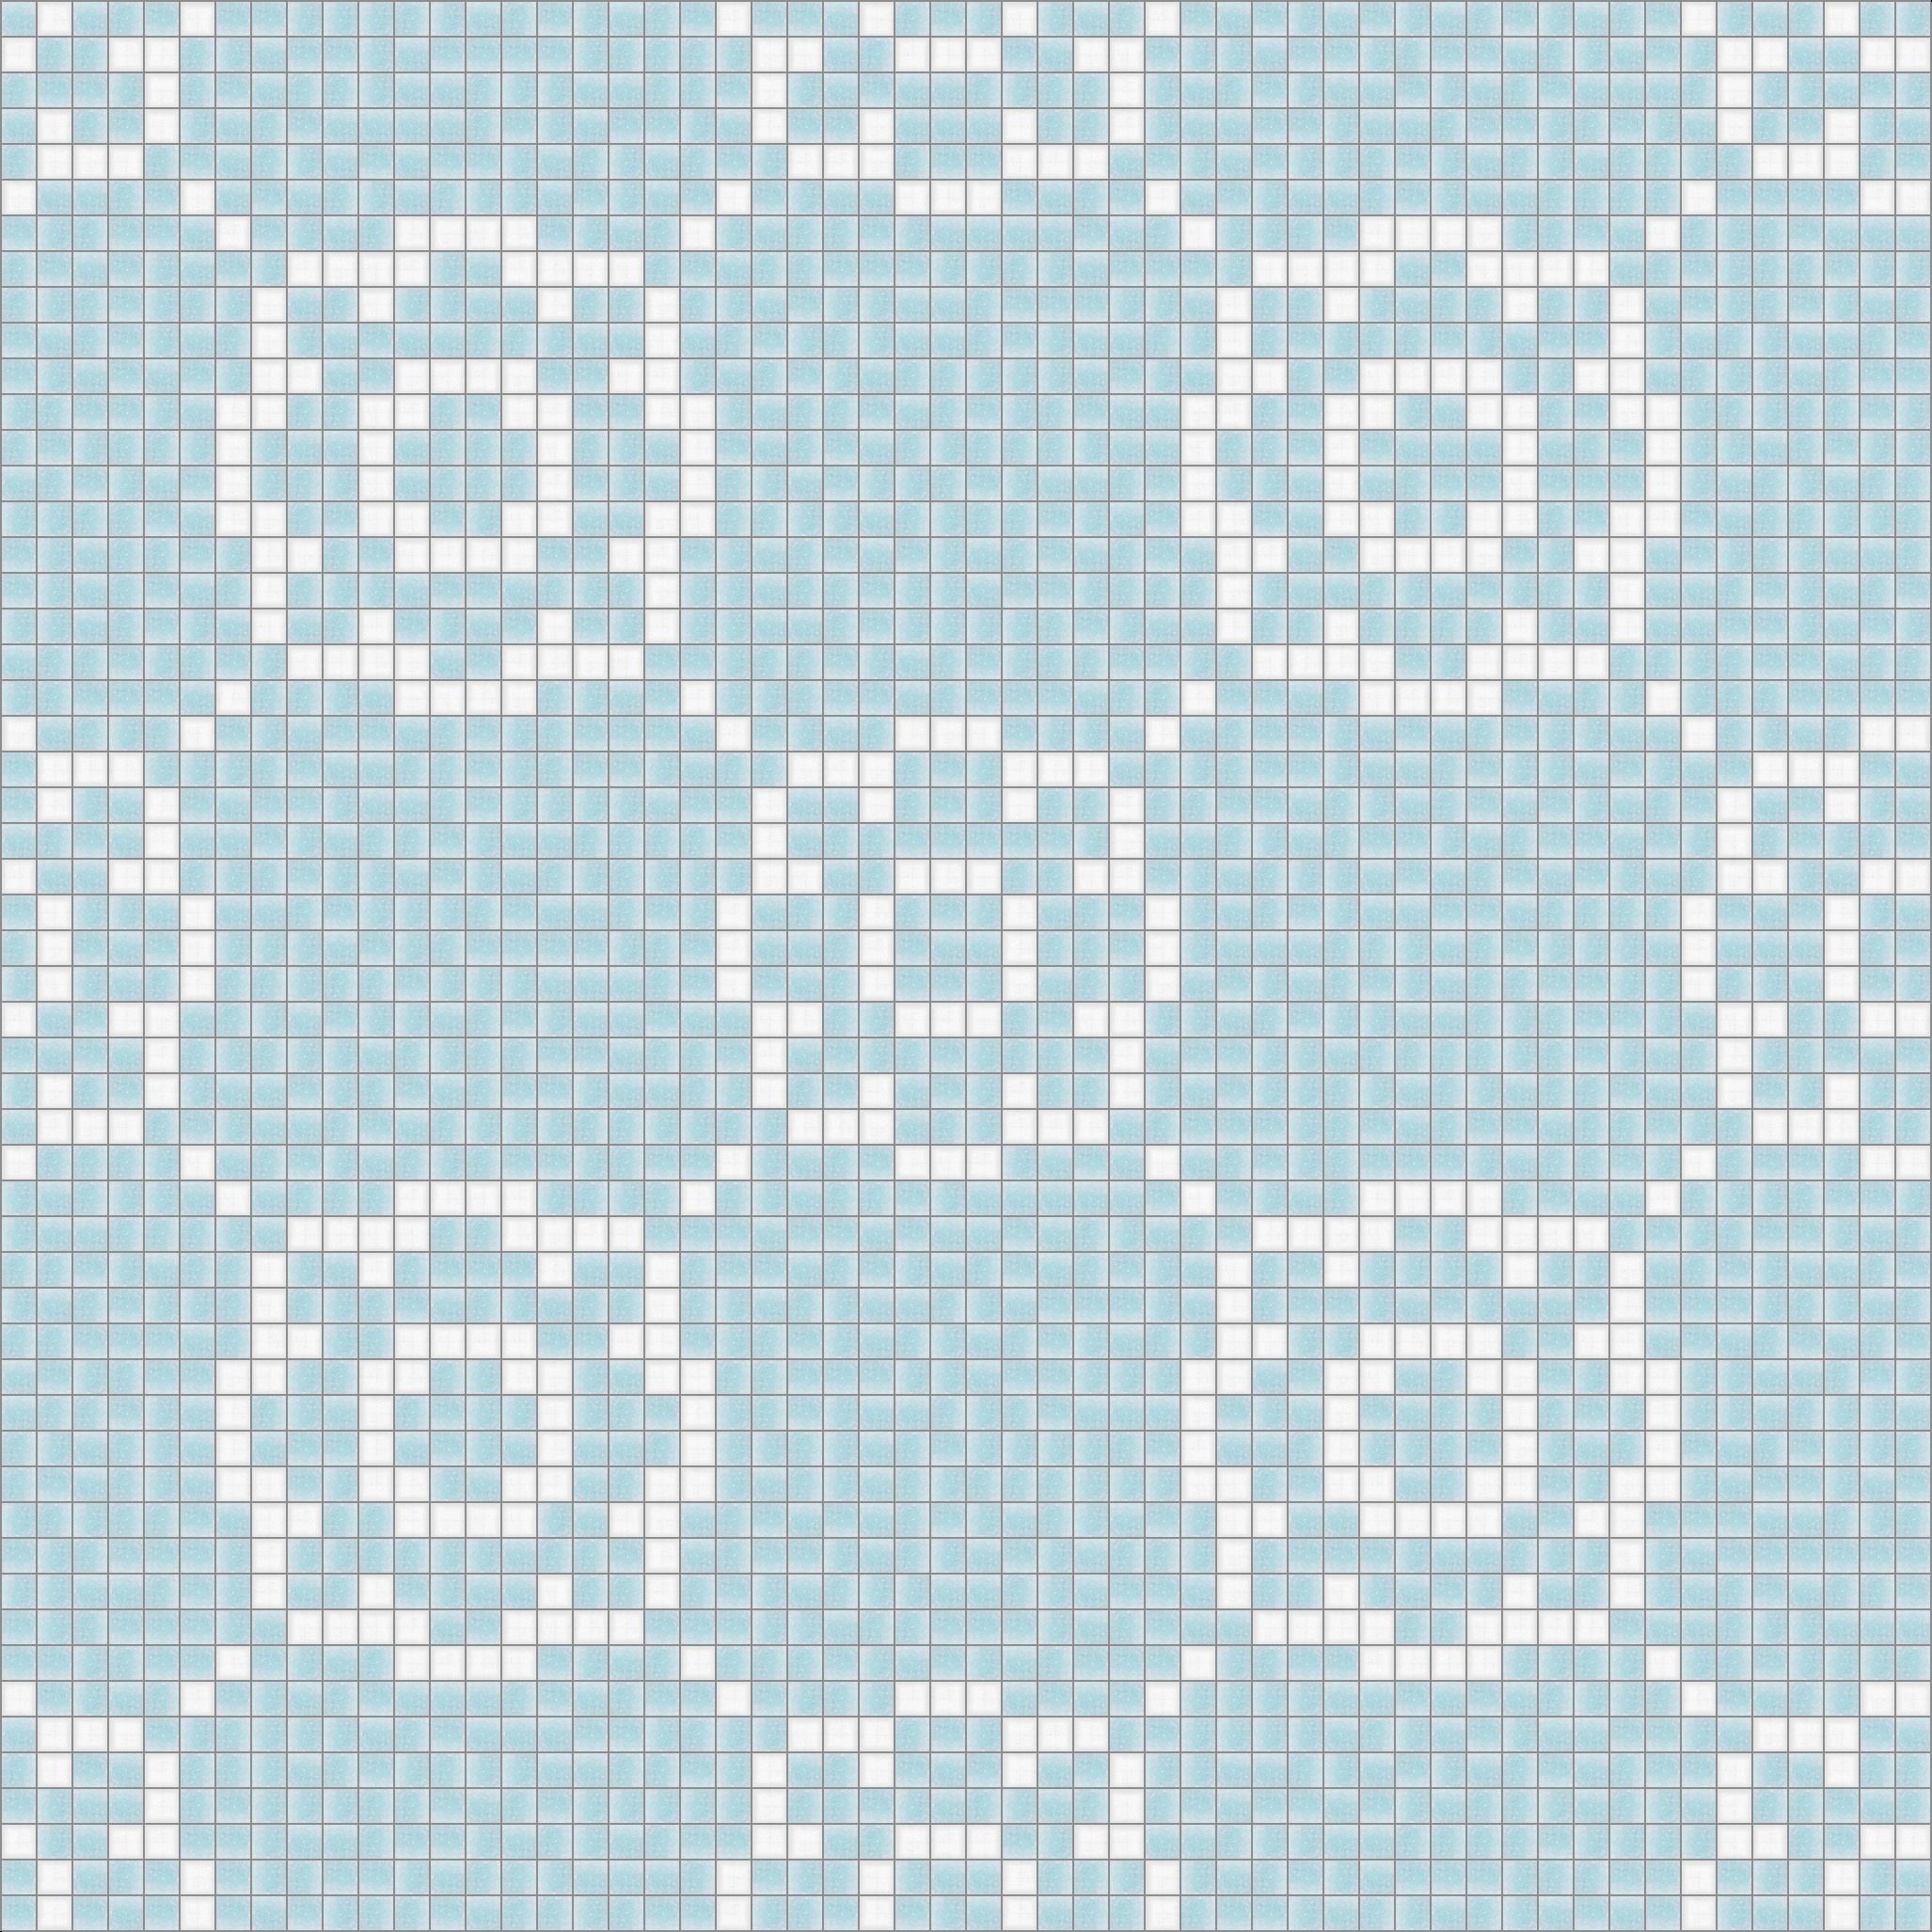 Traditional Flourish Mosaic Tile Pattern | Modern Design | Mosaic ...